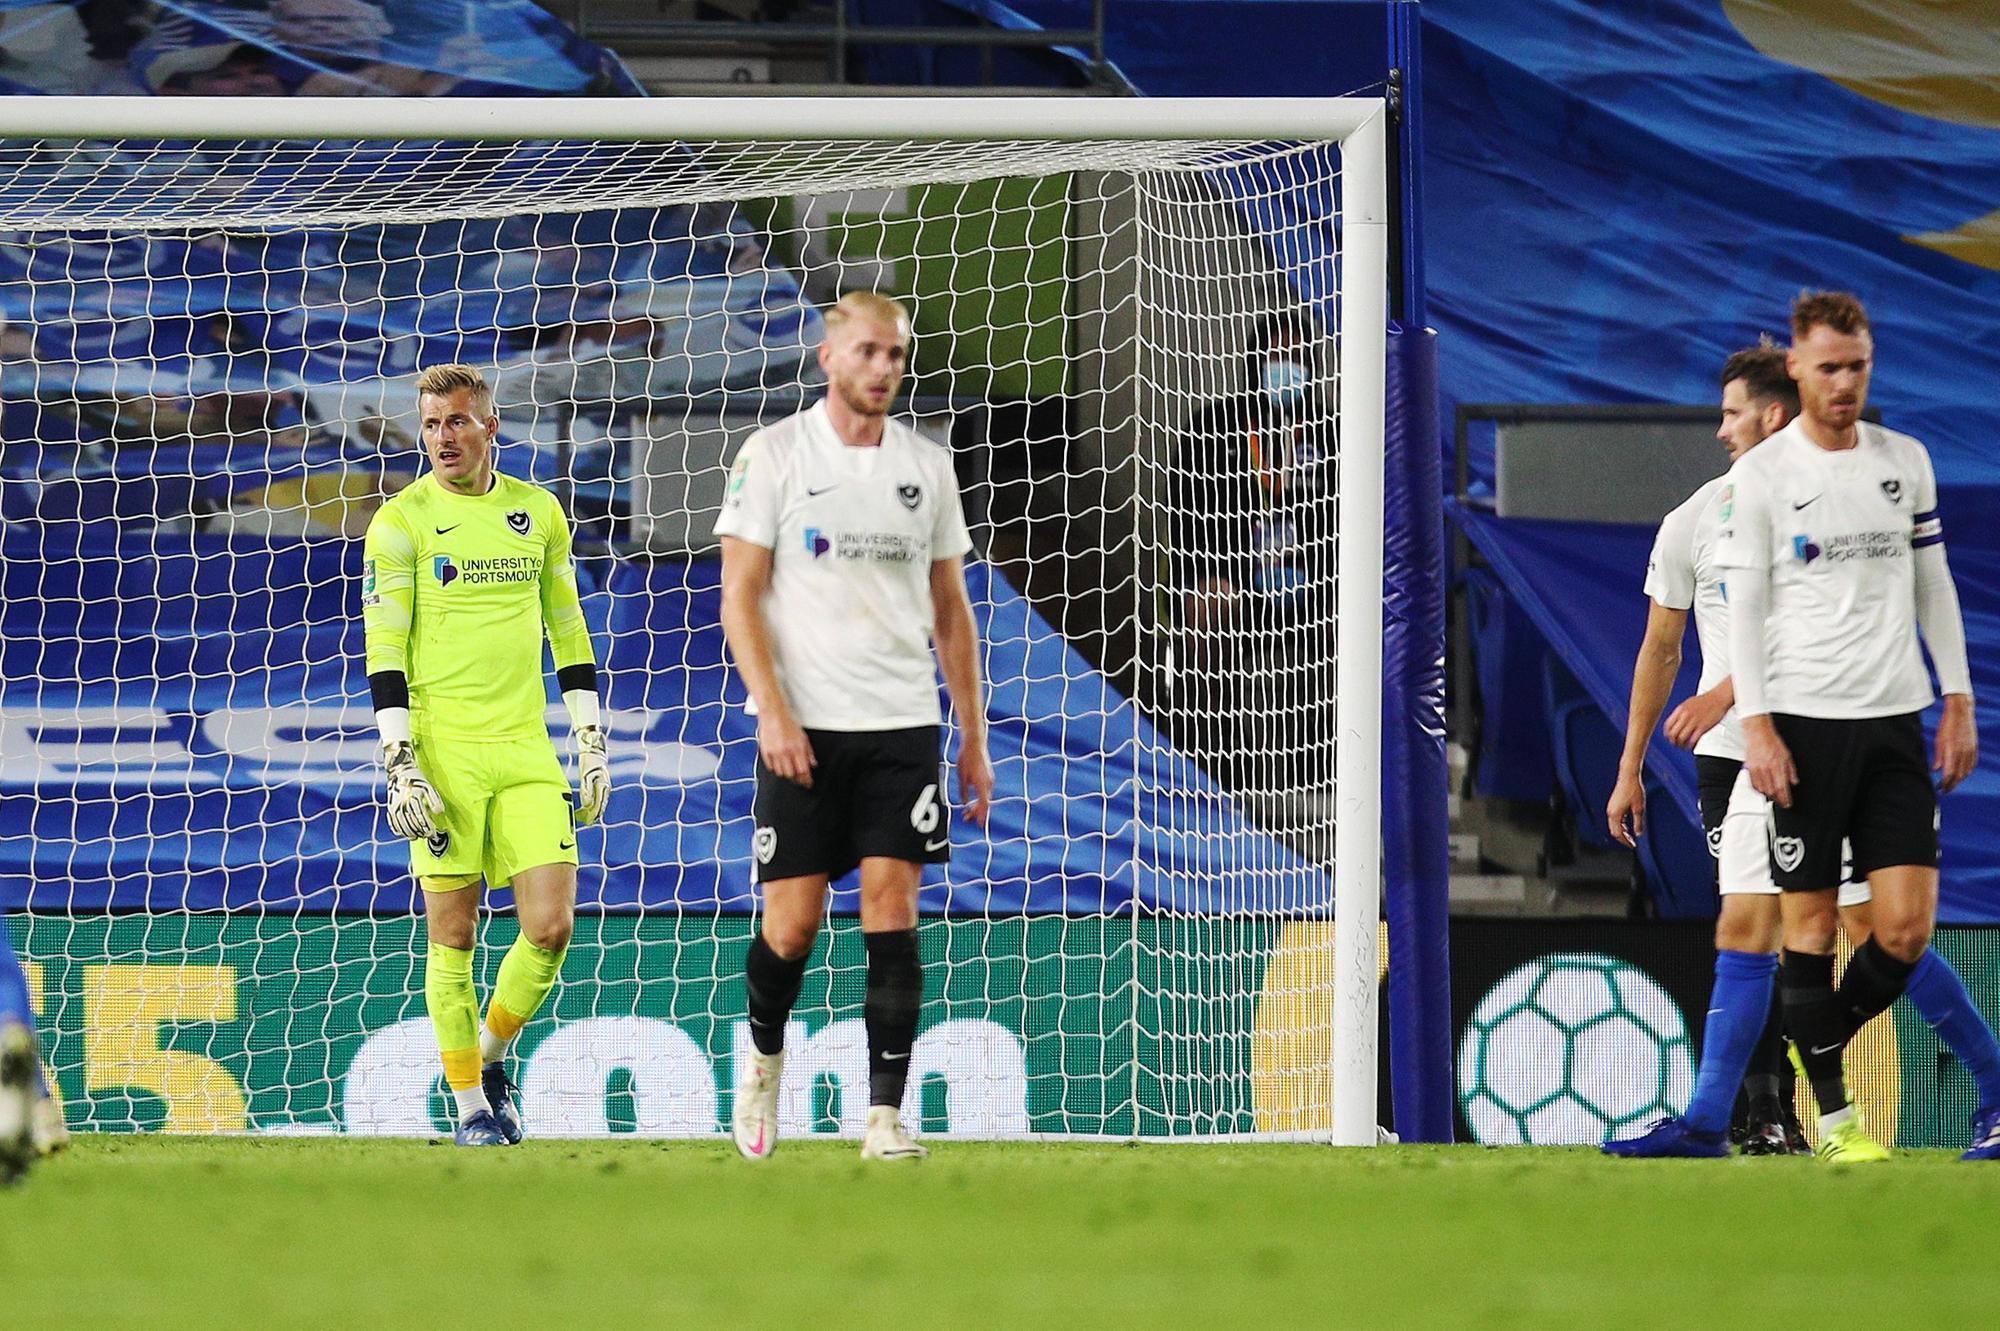 Pompey receive precious Carabao Cup windfall - despite crushing Brighton defeat